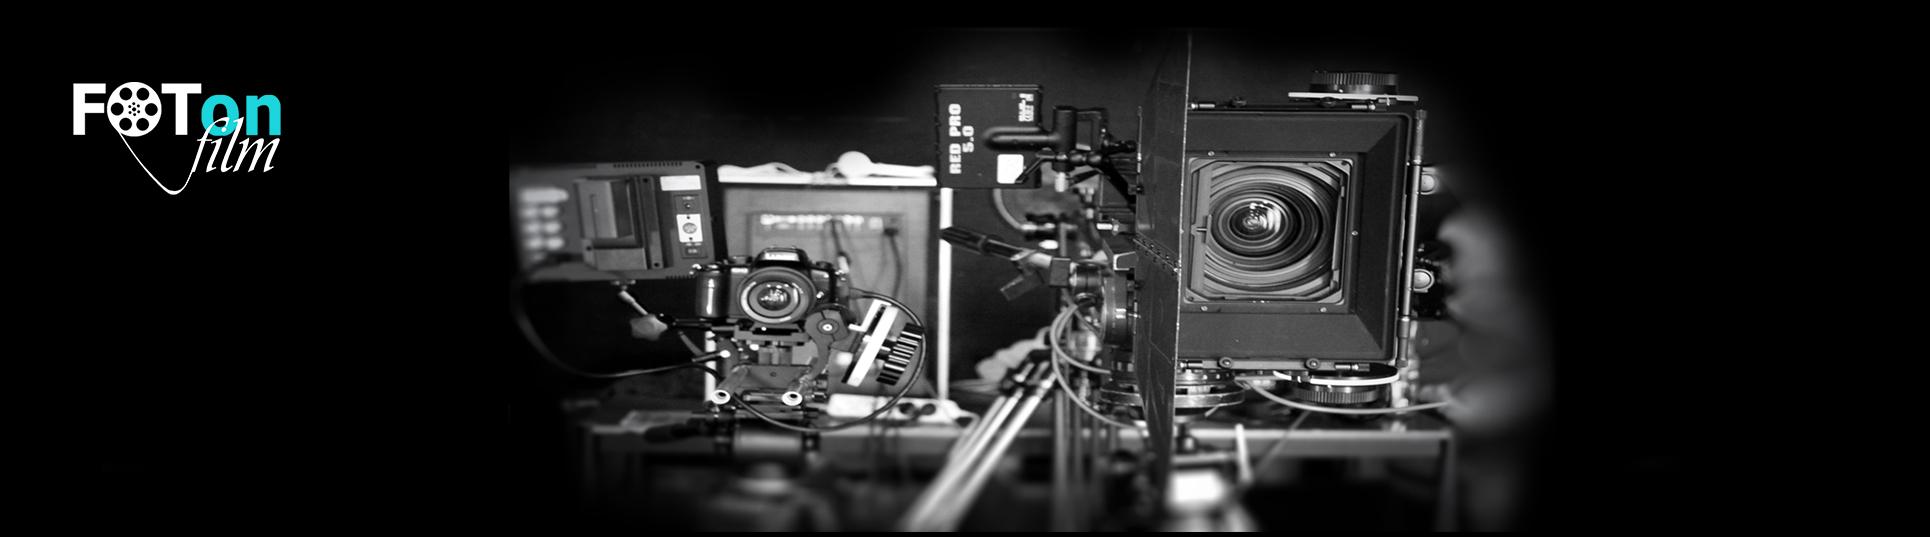 FOTon FILM